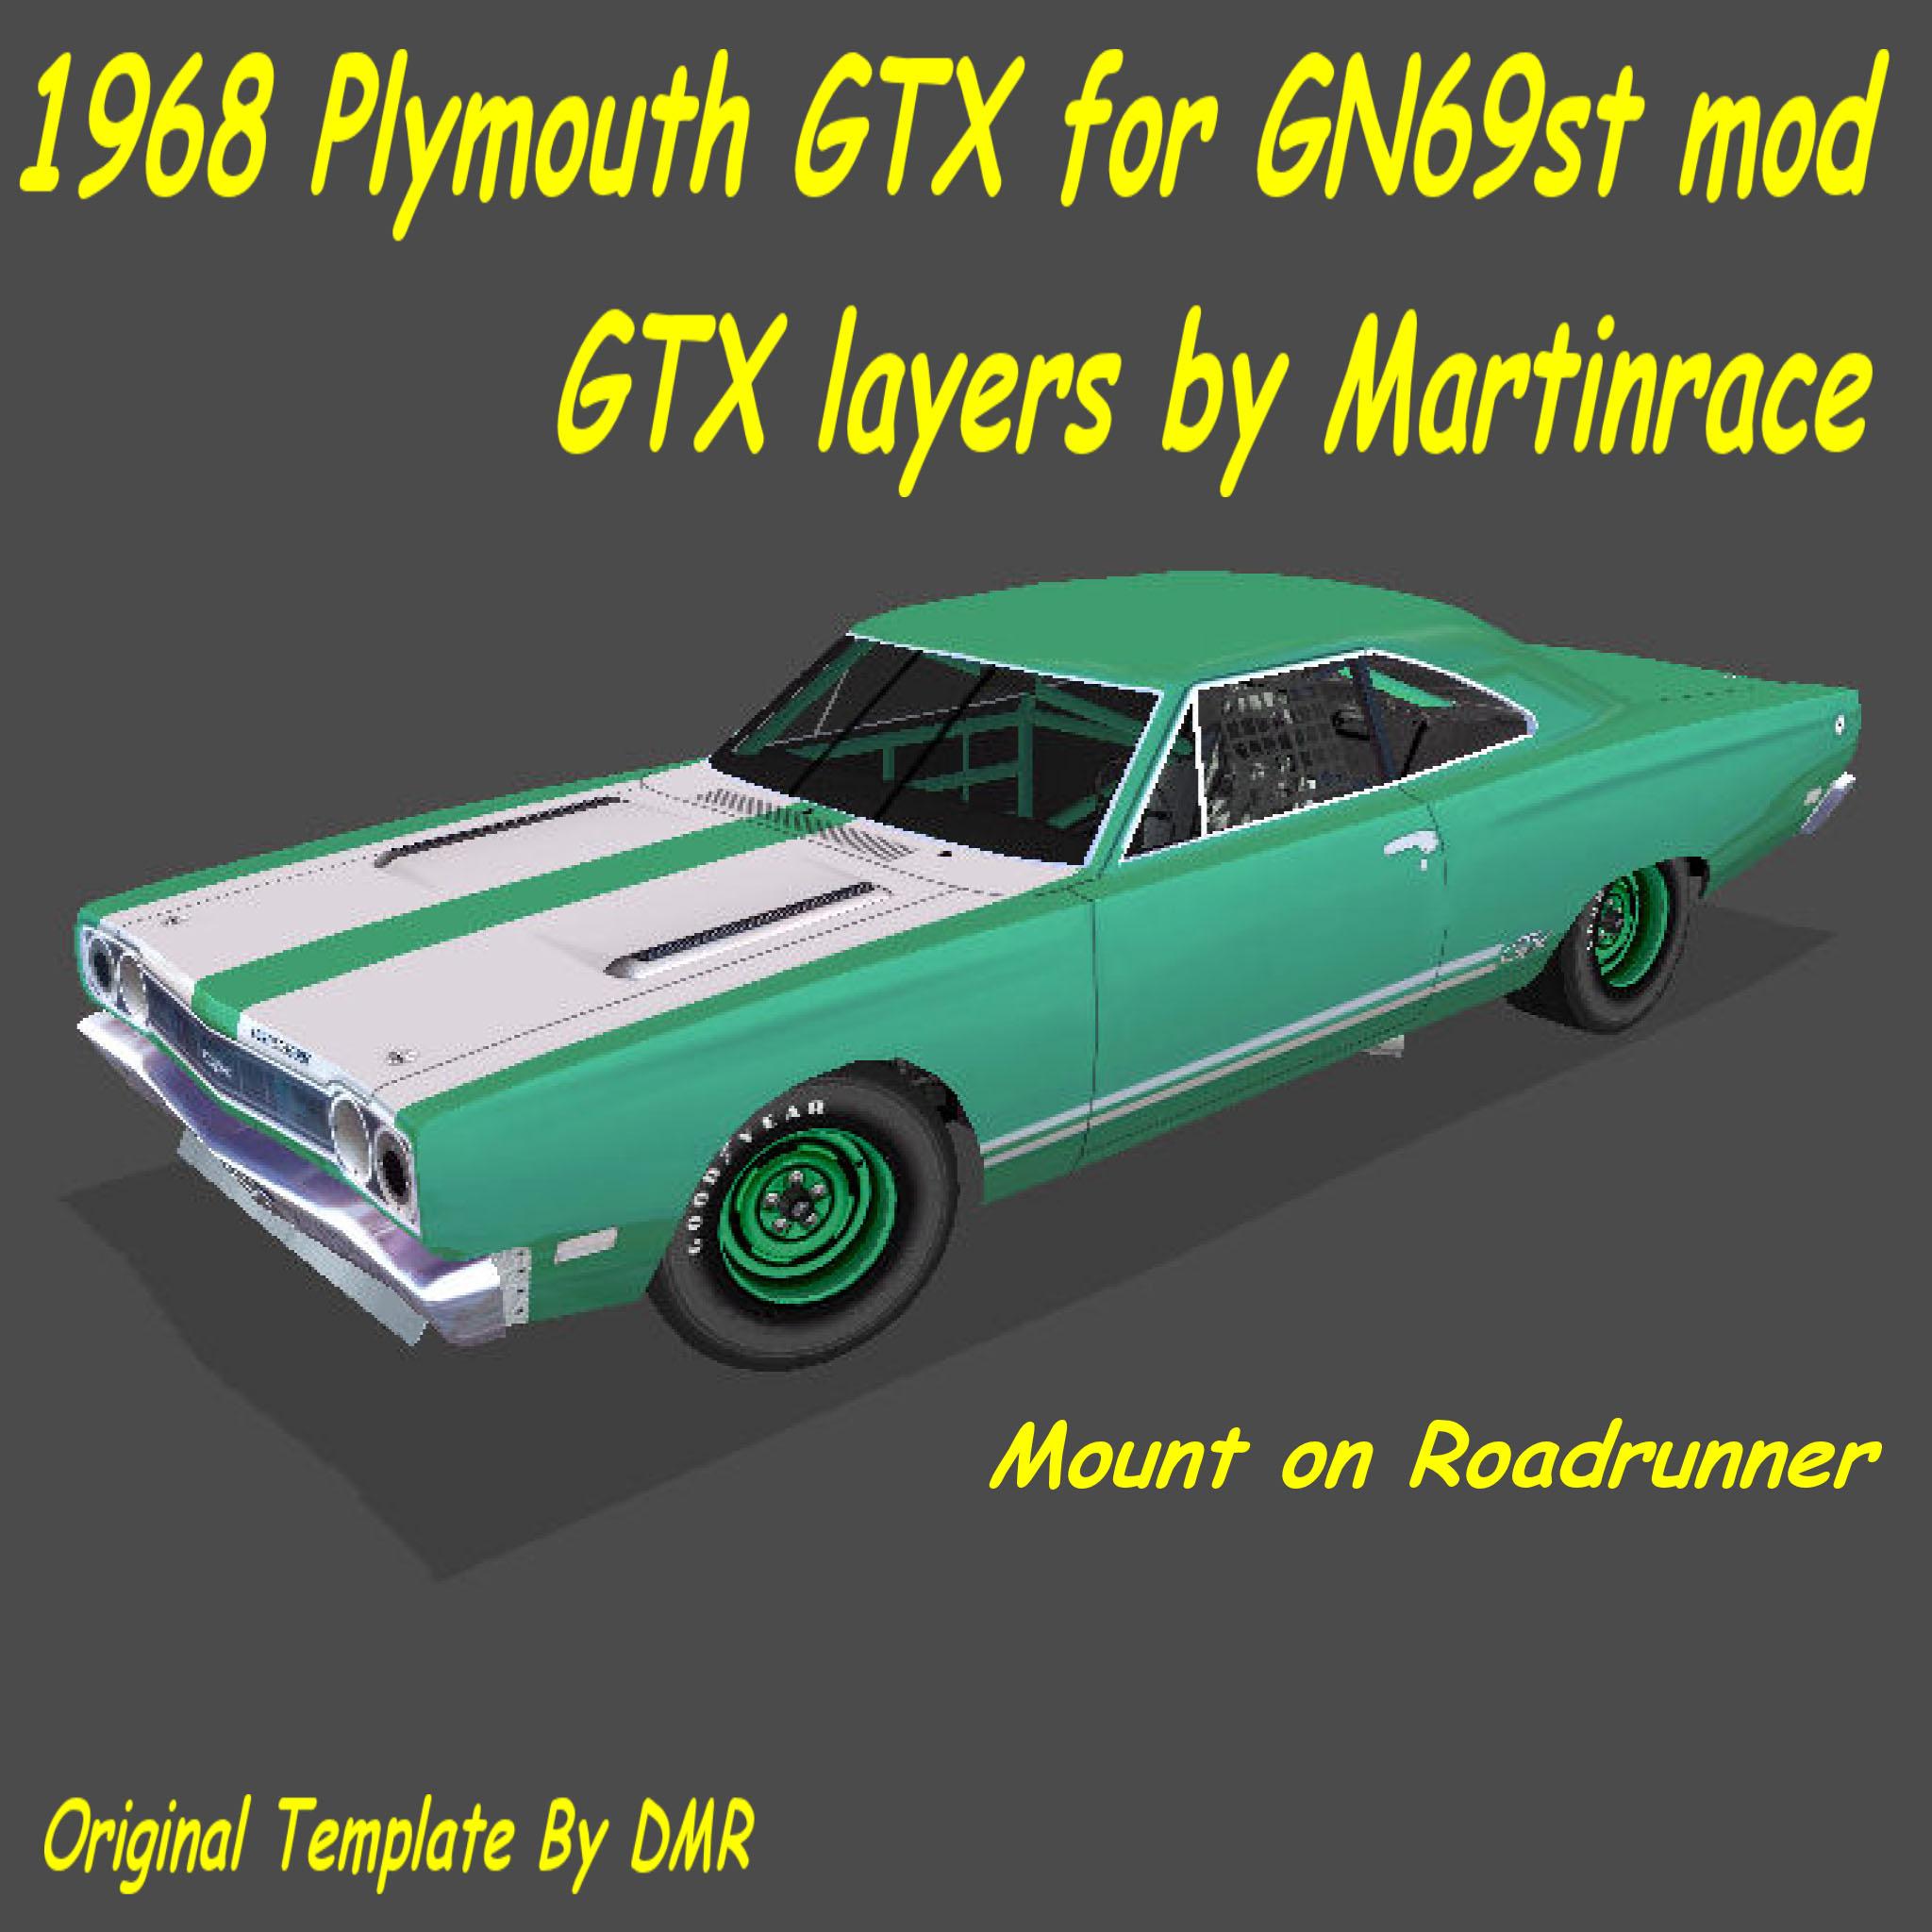 1968 Plymouth GTX.jpg